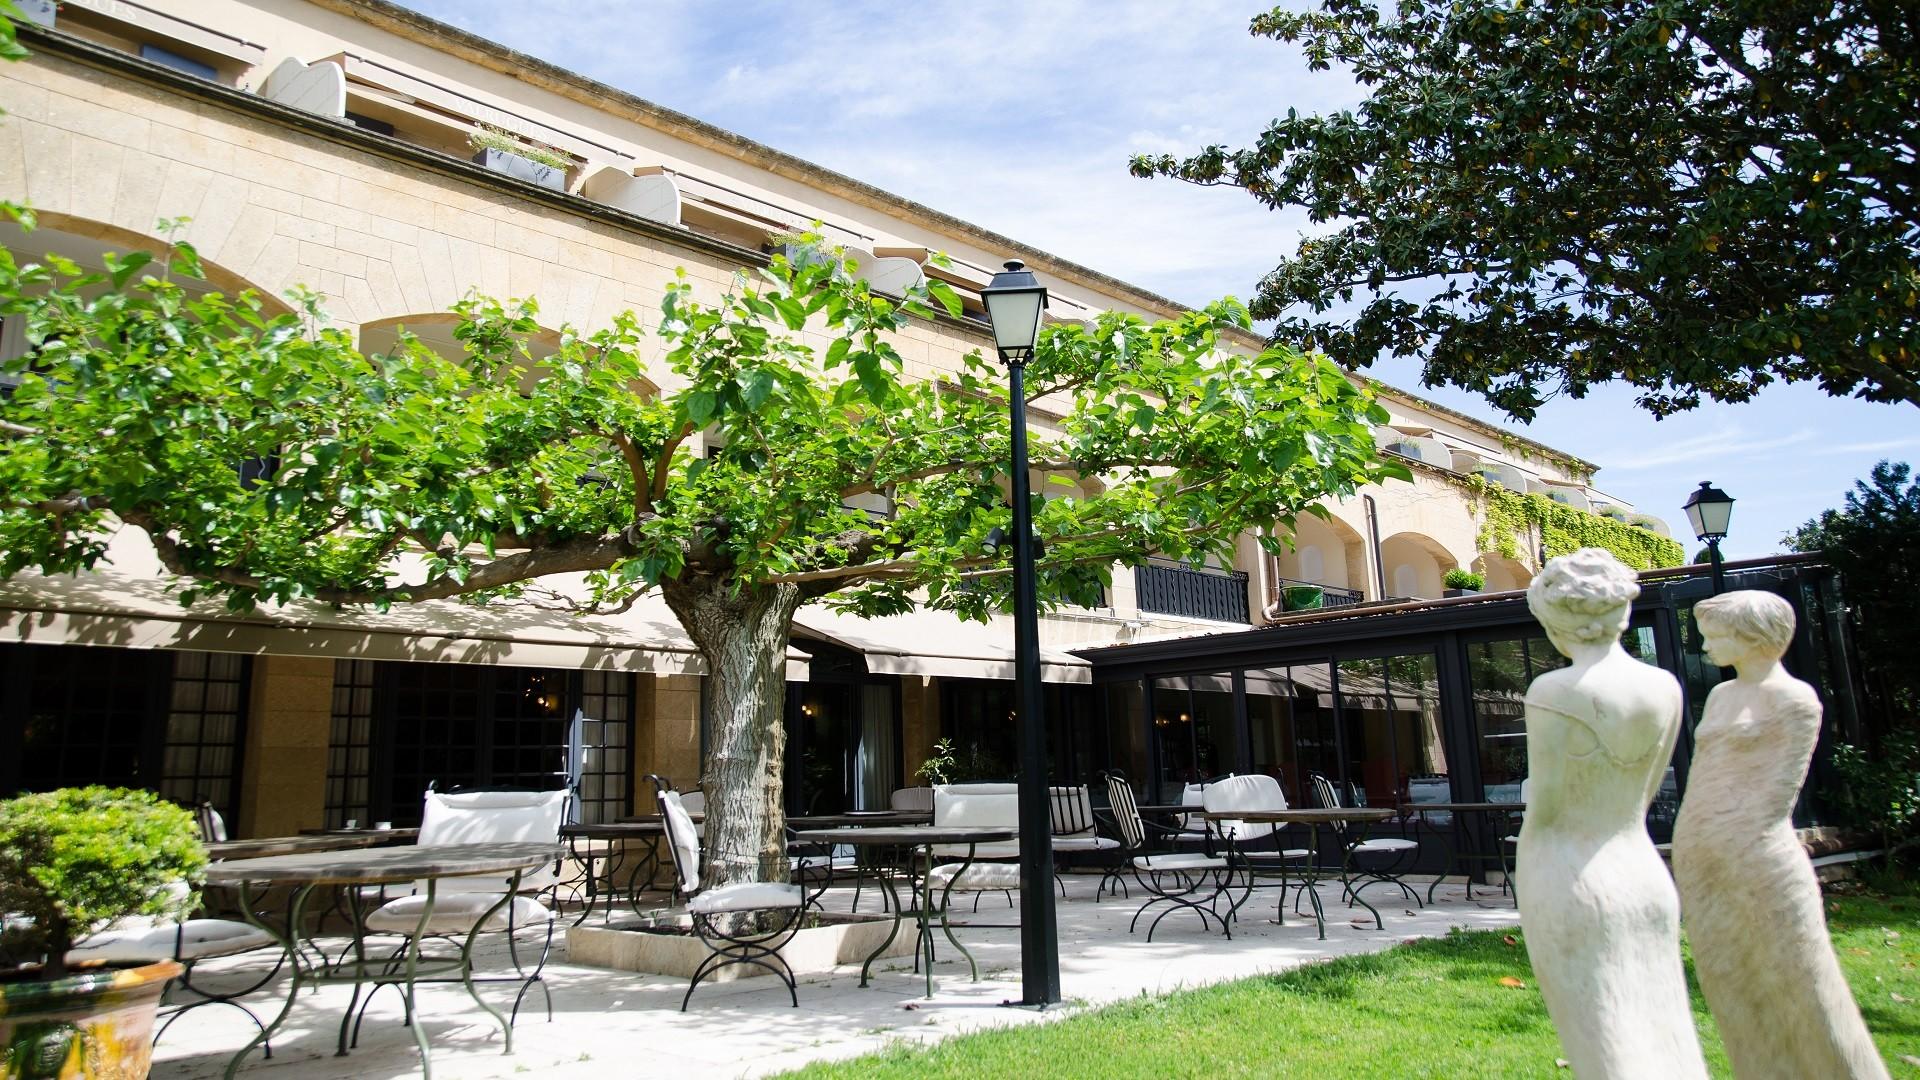 Vallon-de-Valrugues-saint-remy-de-provence-terrasses-seminaires-de-caractere